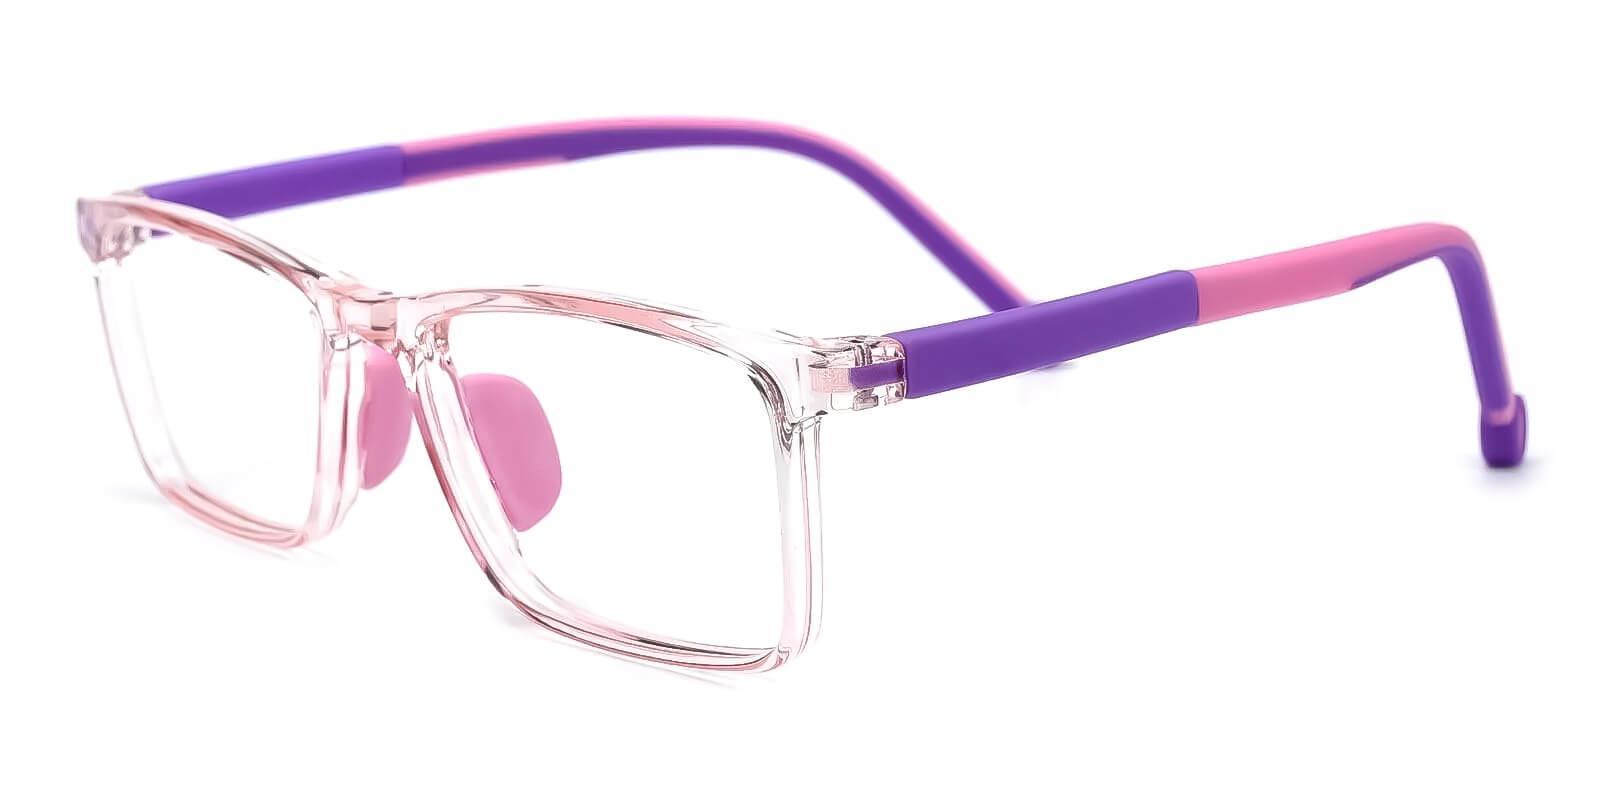 Kids-Rapture Pink TR Eyeglasses , Fashion , UniversalBridgeFit Frames from ABBE Glasses